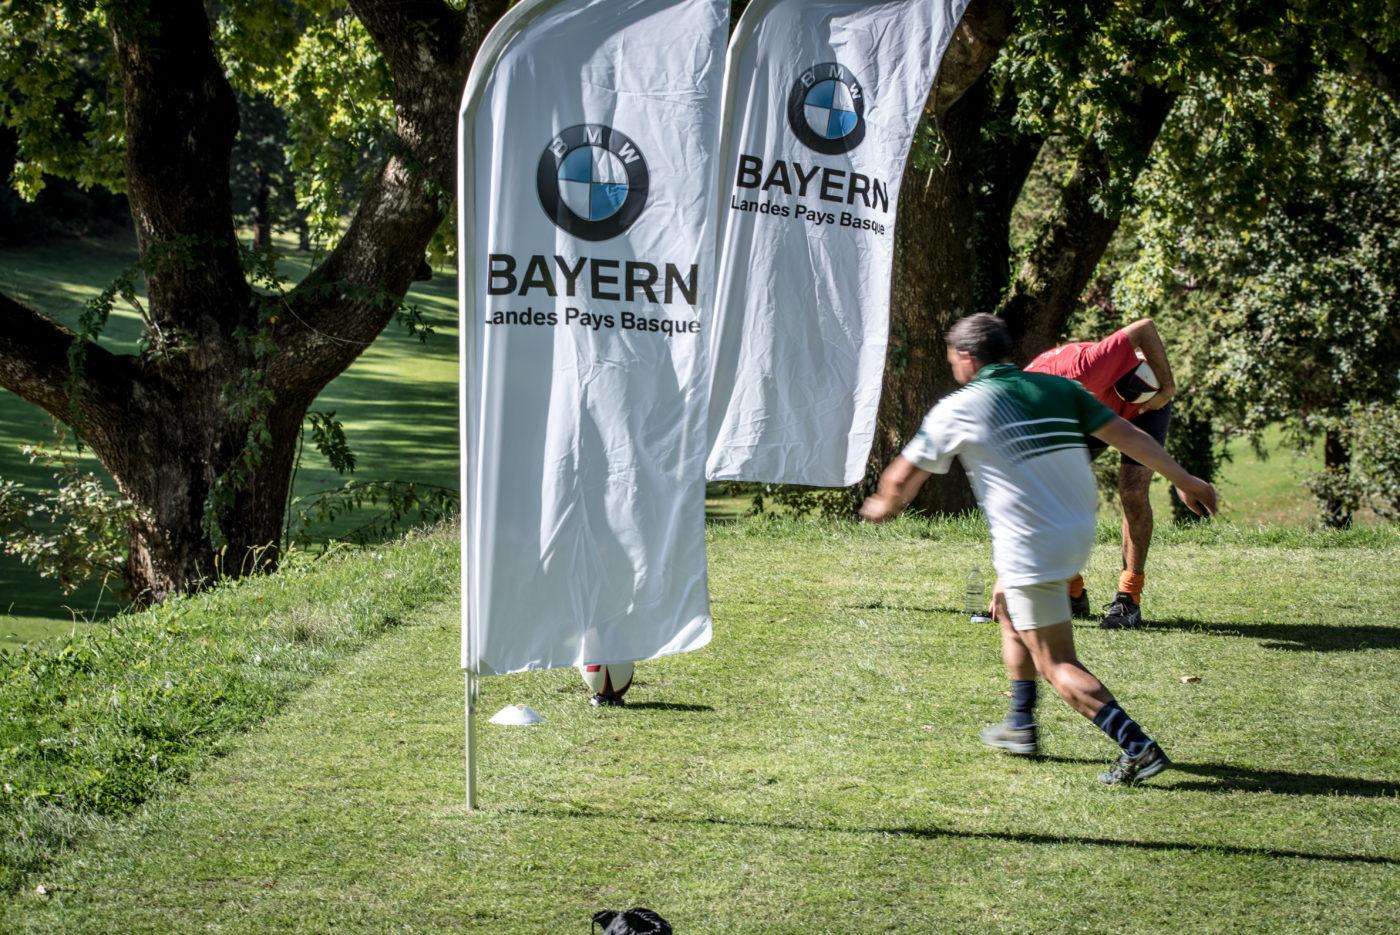 Événement Rugby Golf IRPB 2019 Chantaco Inter réseau Pays basque Agence Erronda BMW